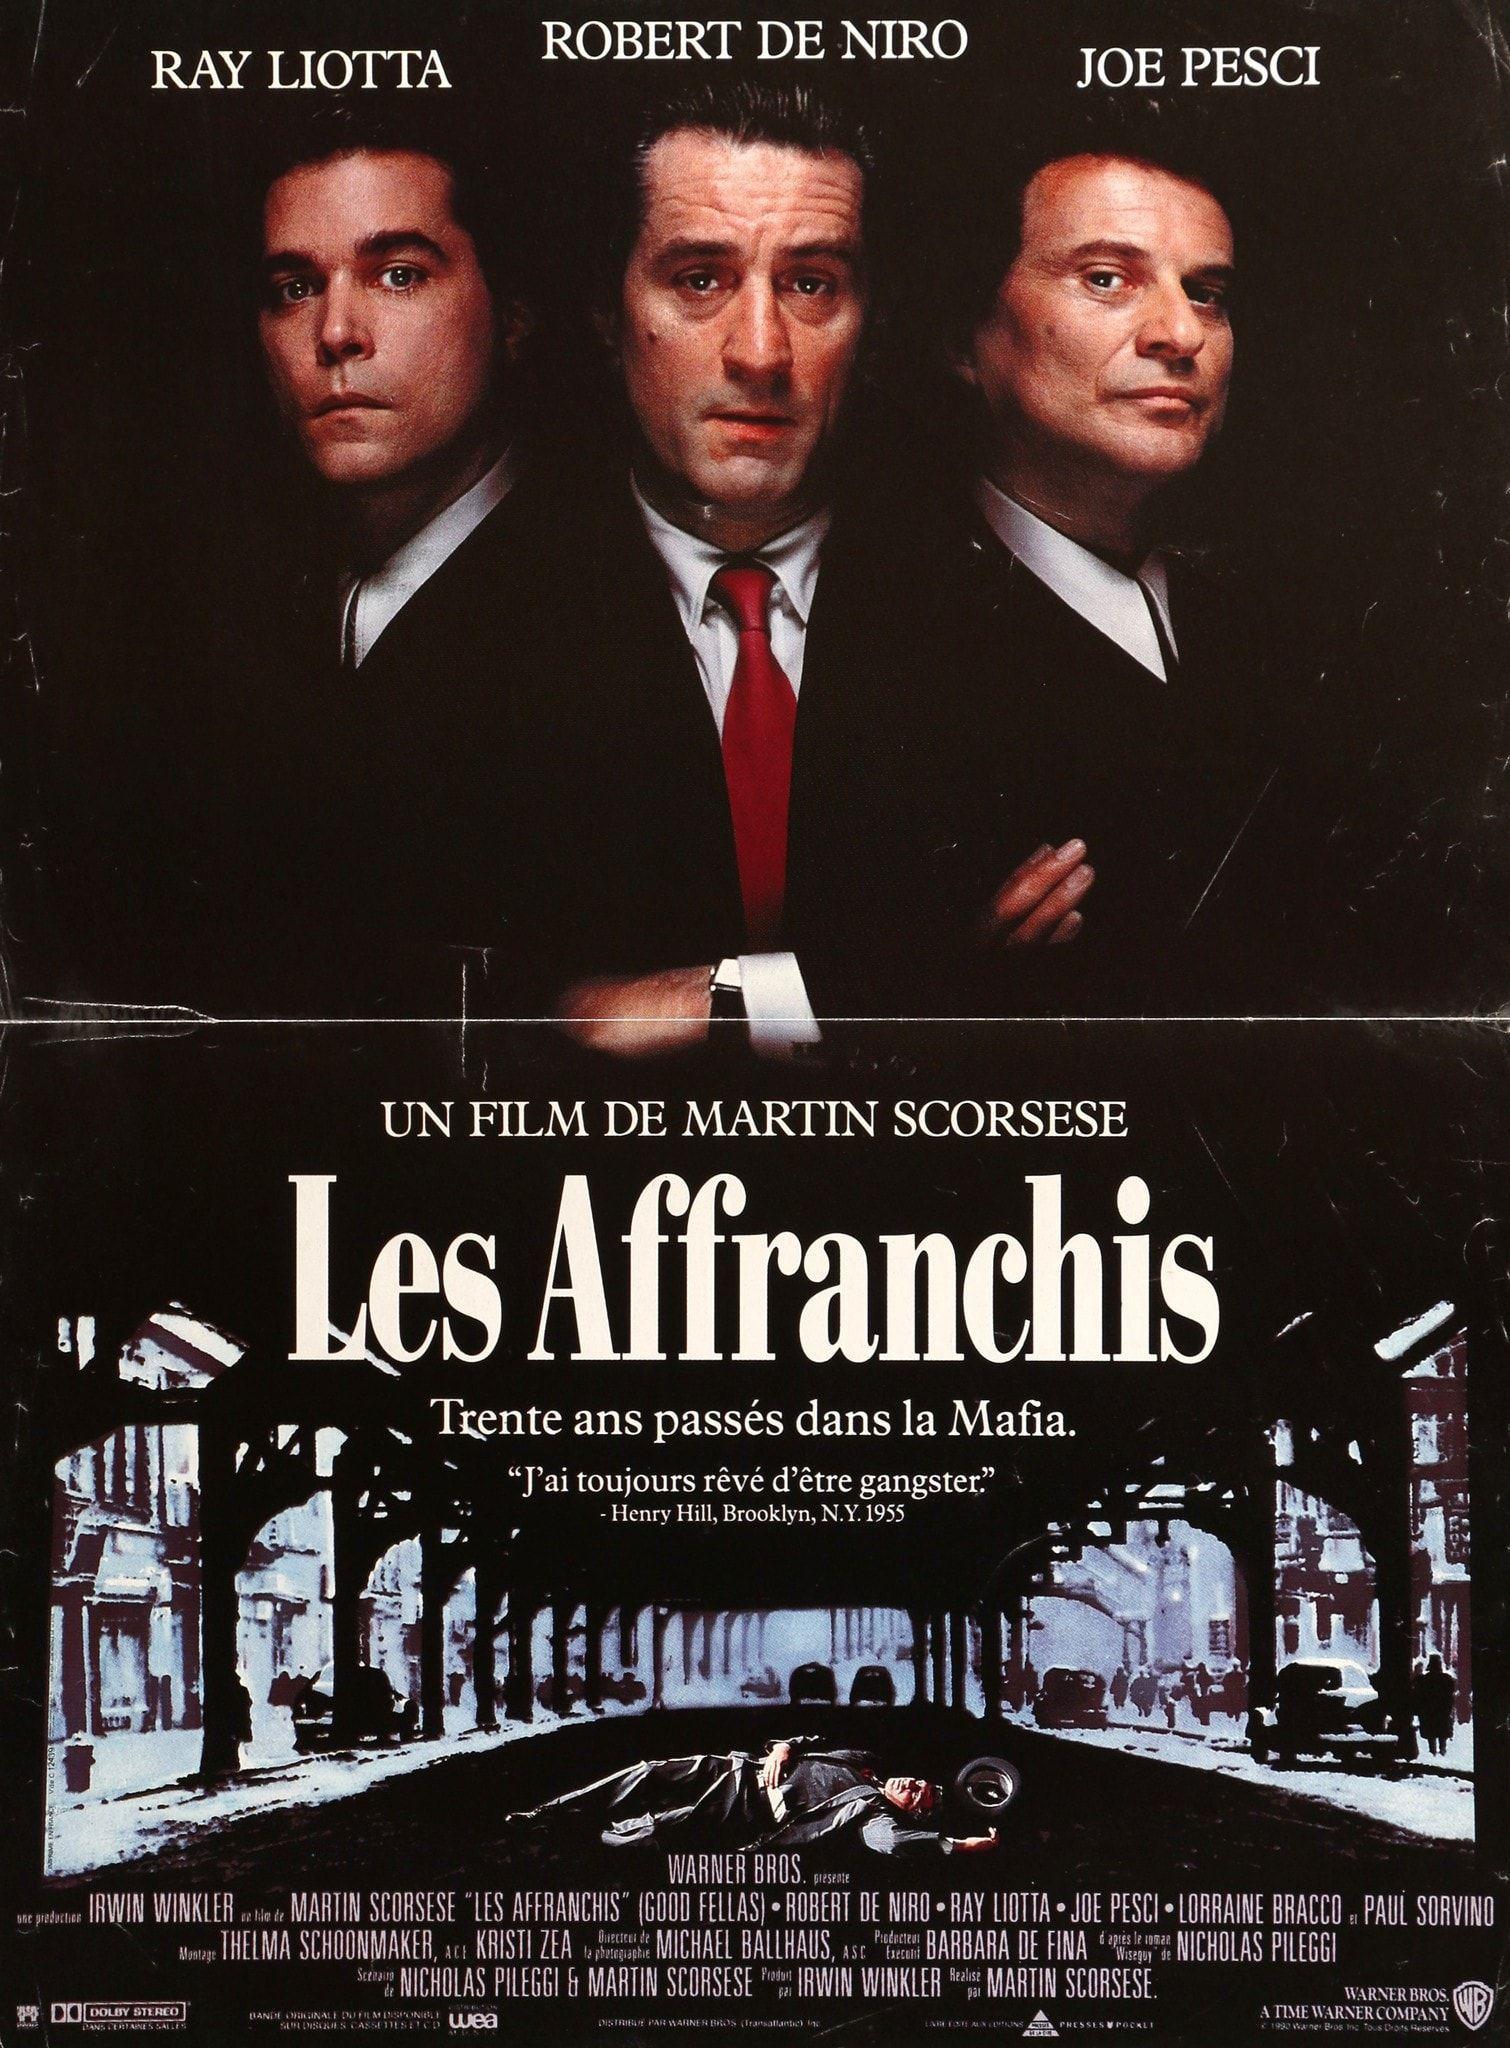 Goodfellas 1990 Goodfellas Martin Scorsese Goodfellas 1990